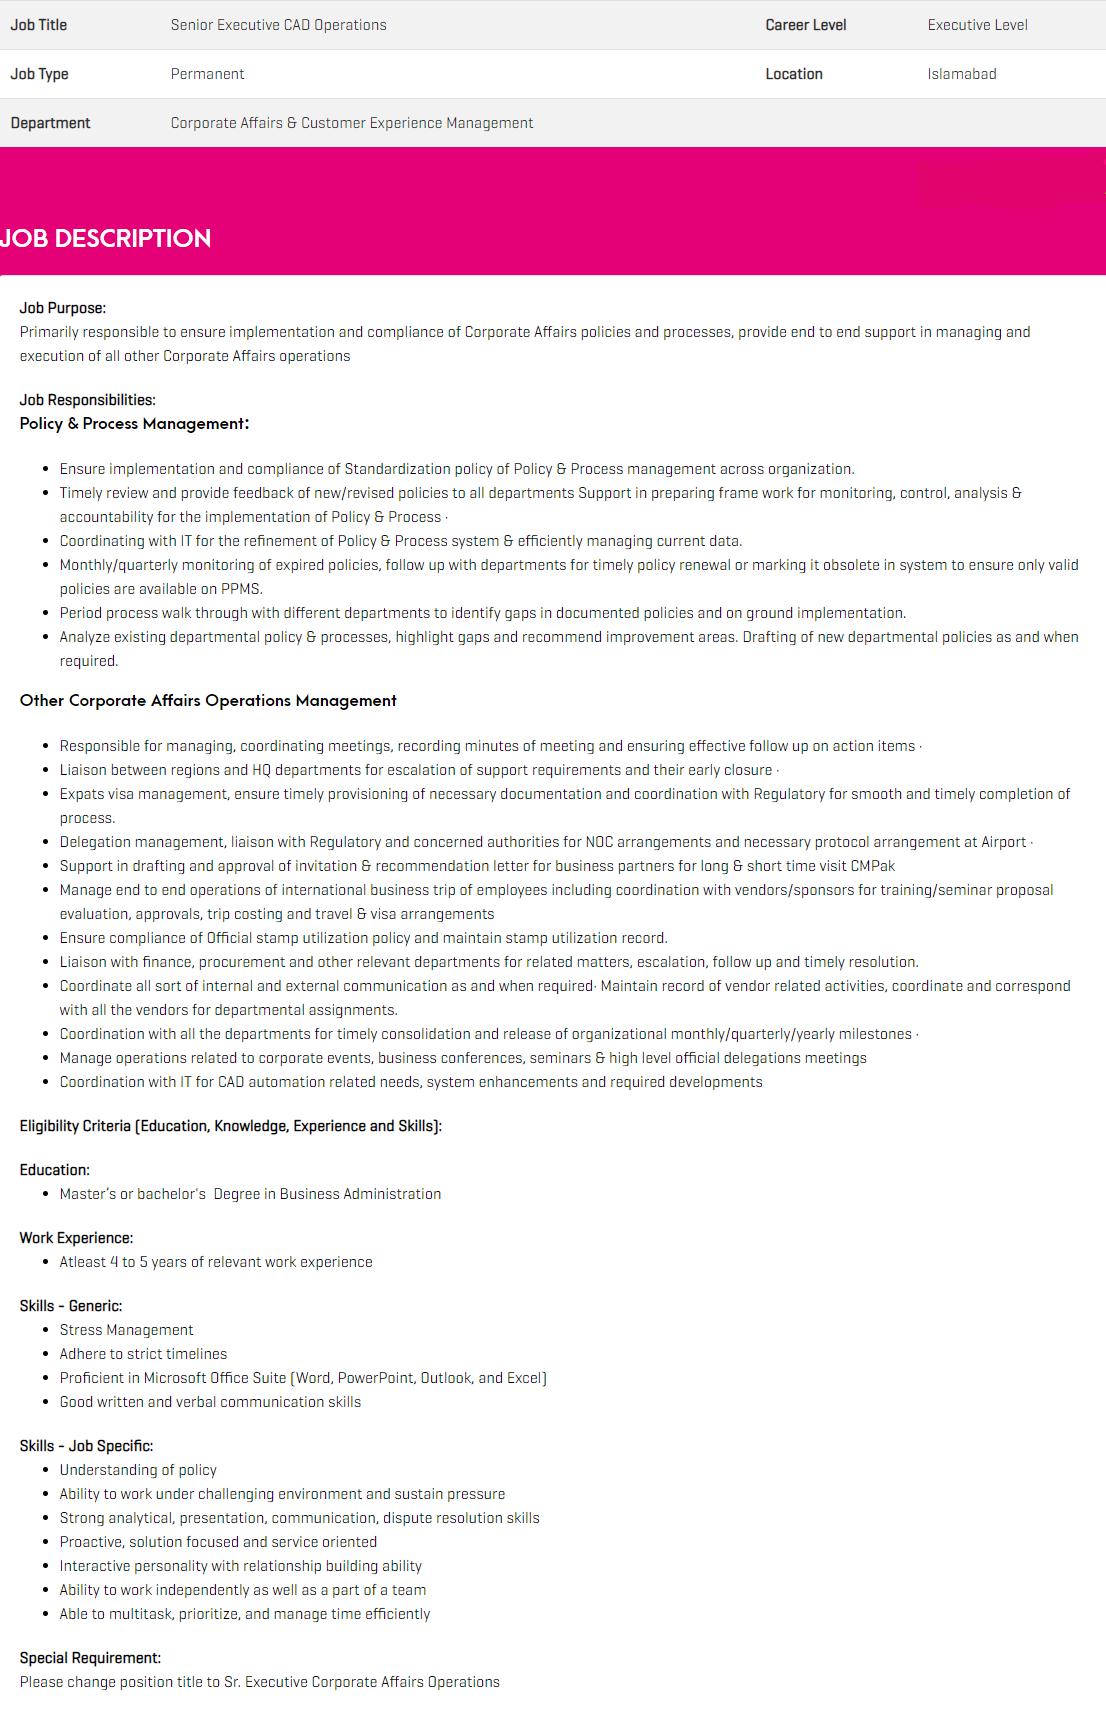 Senior Executive CAD Operations Jobs 2020 in Islamabad